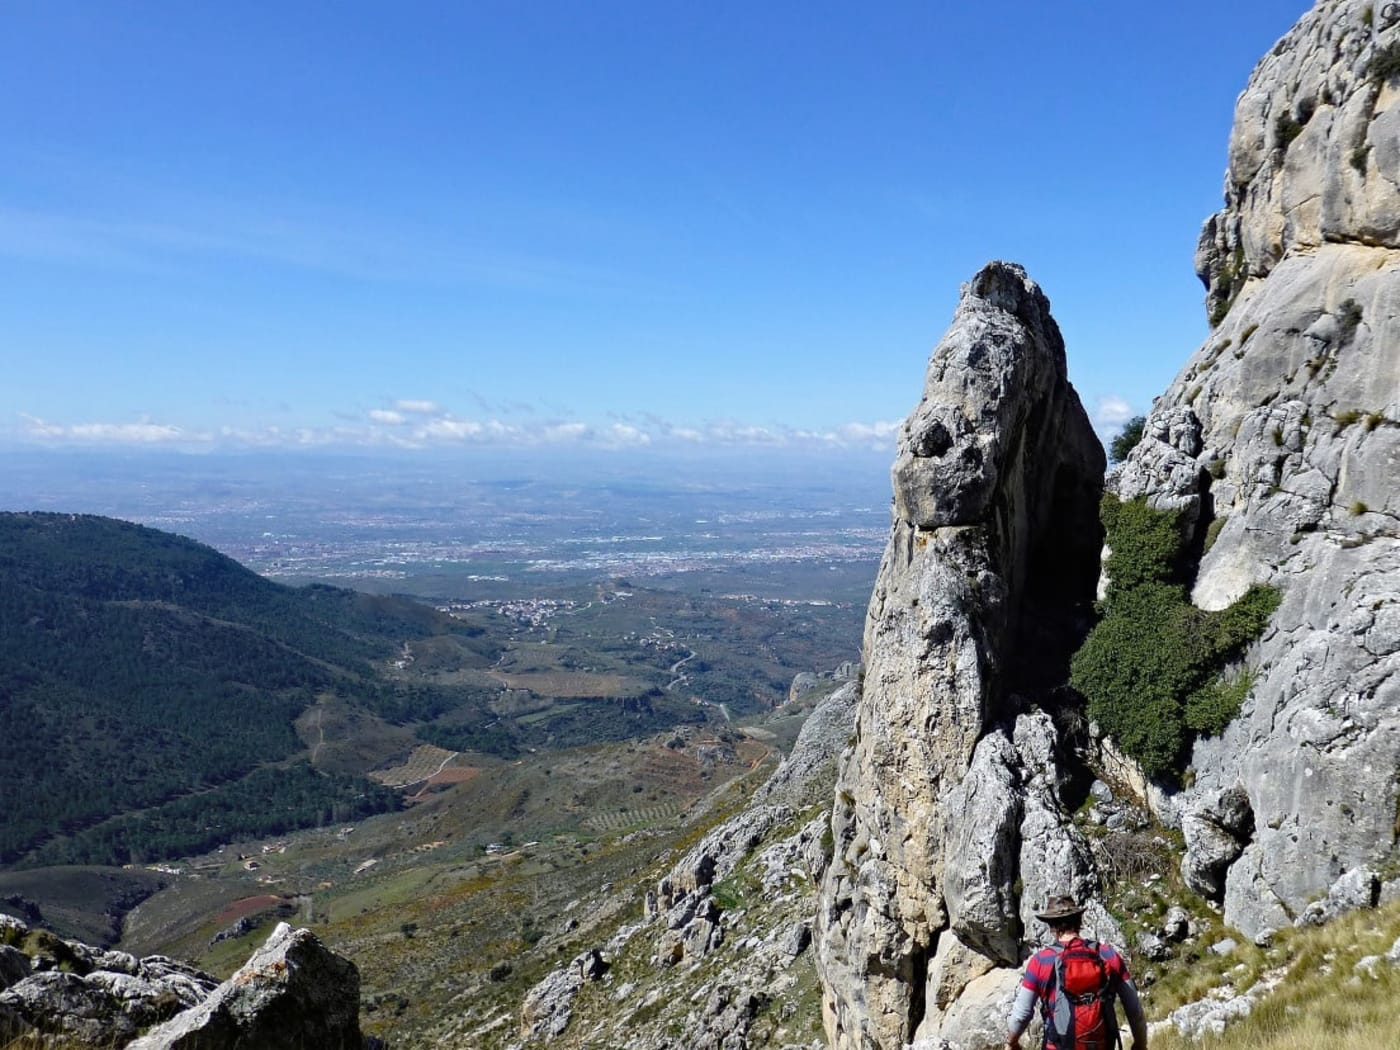 Stunning scenery in the relatively unknown Sierra de Huetor